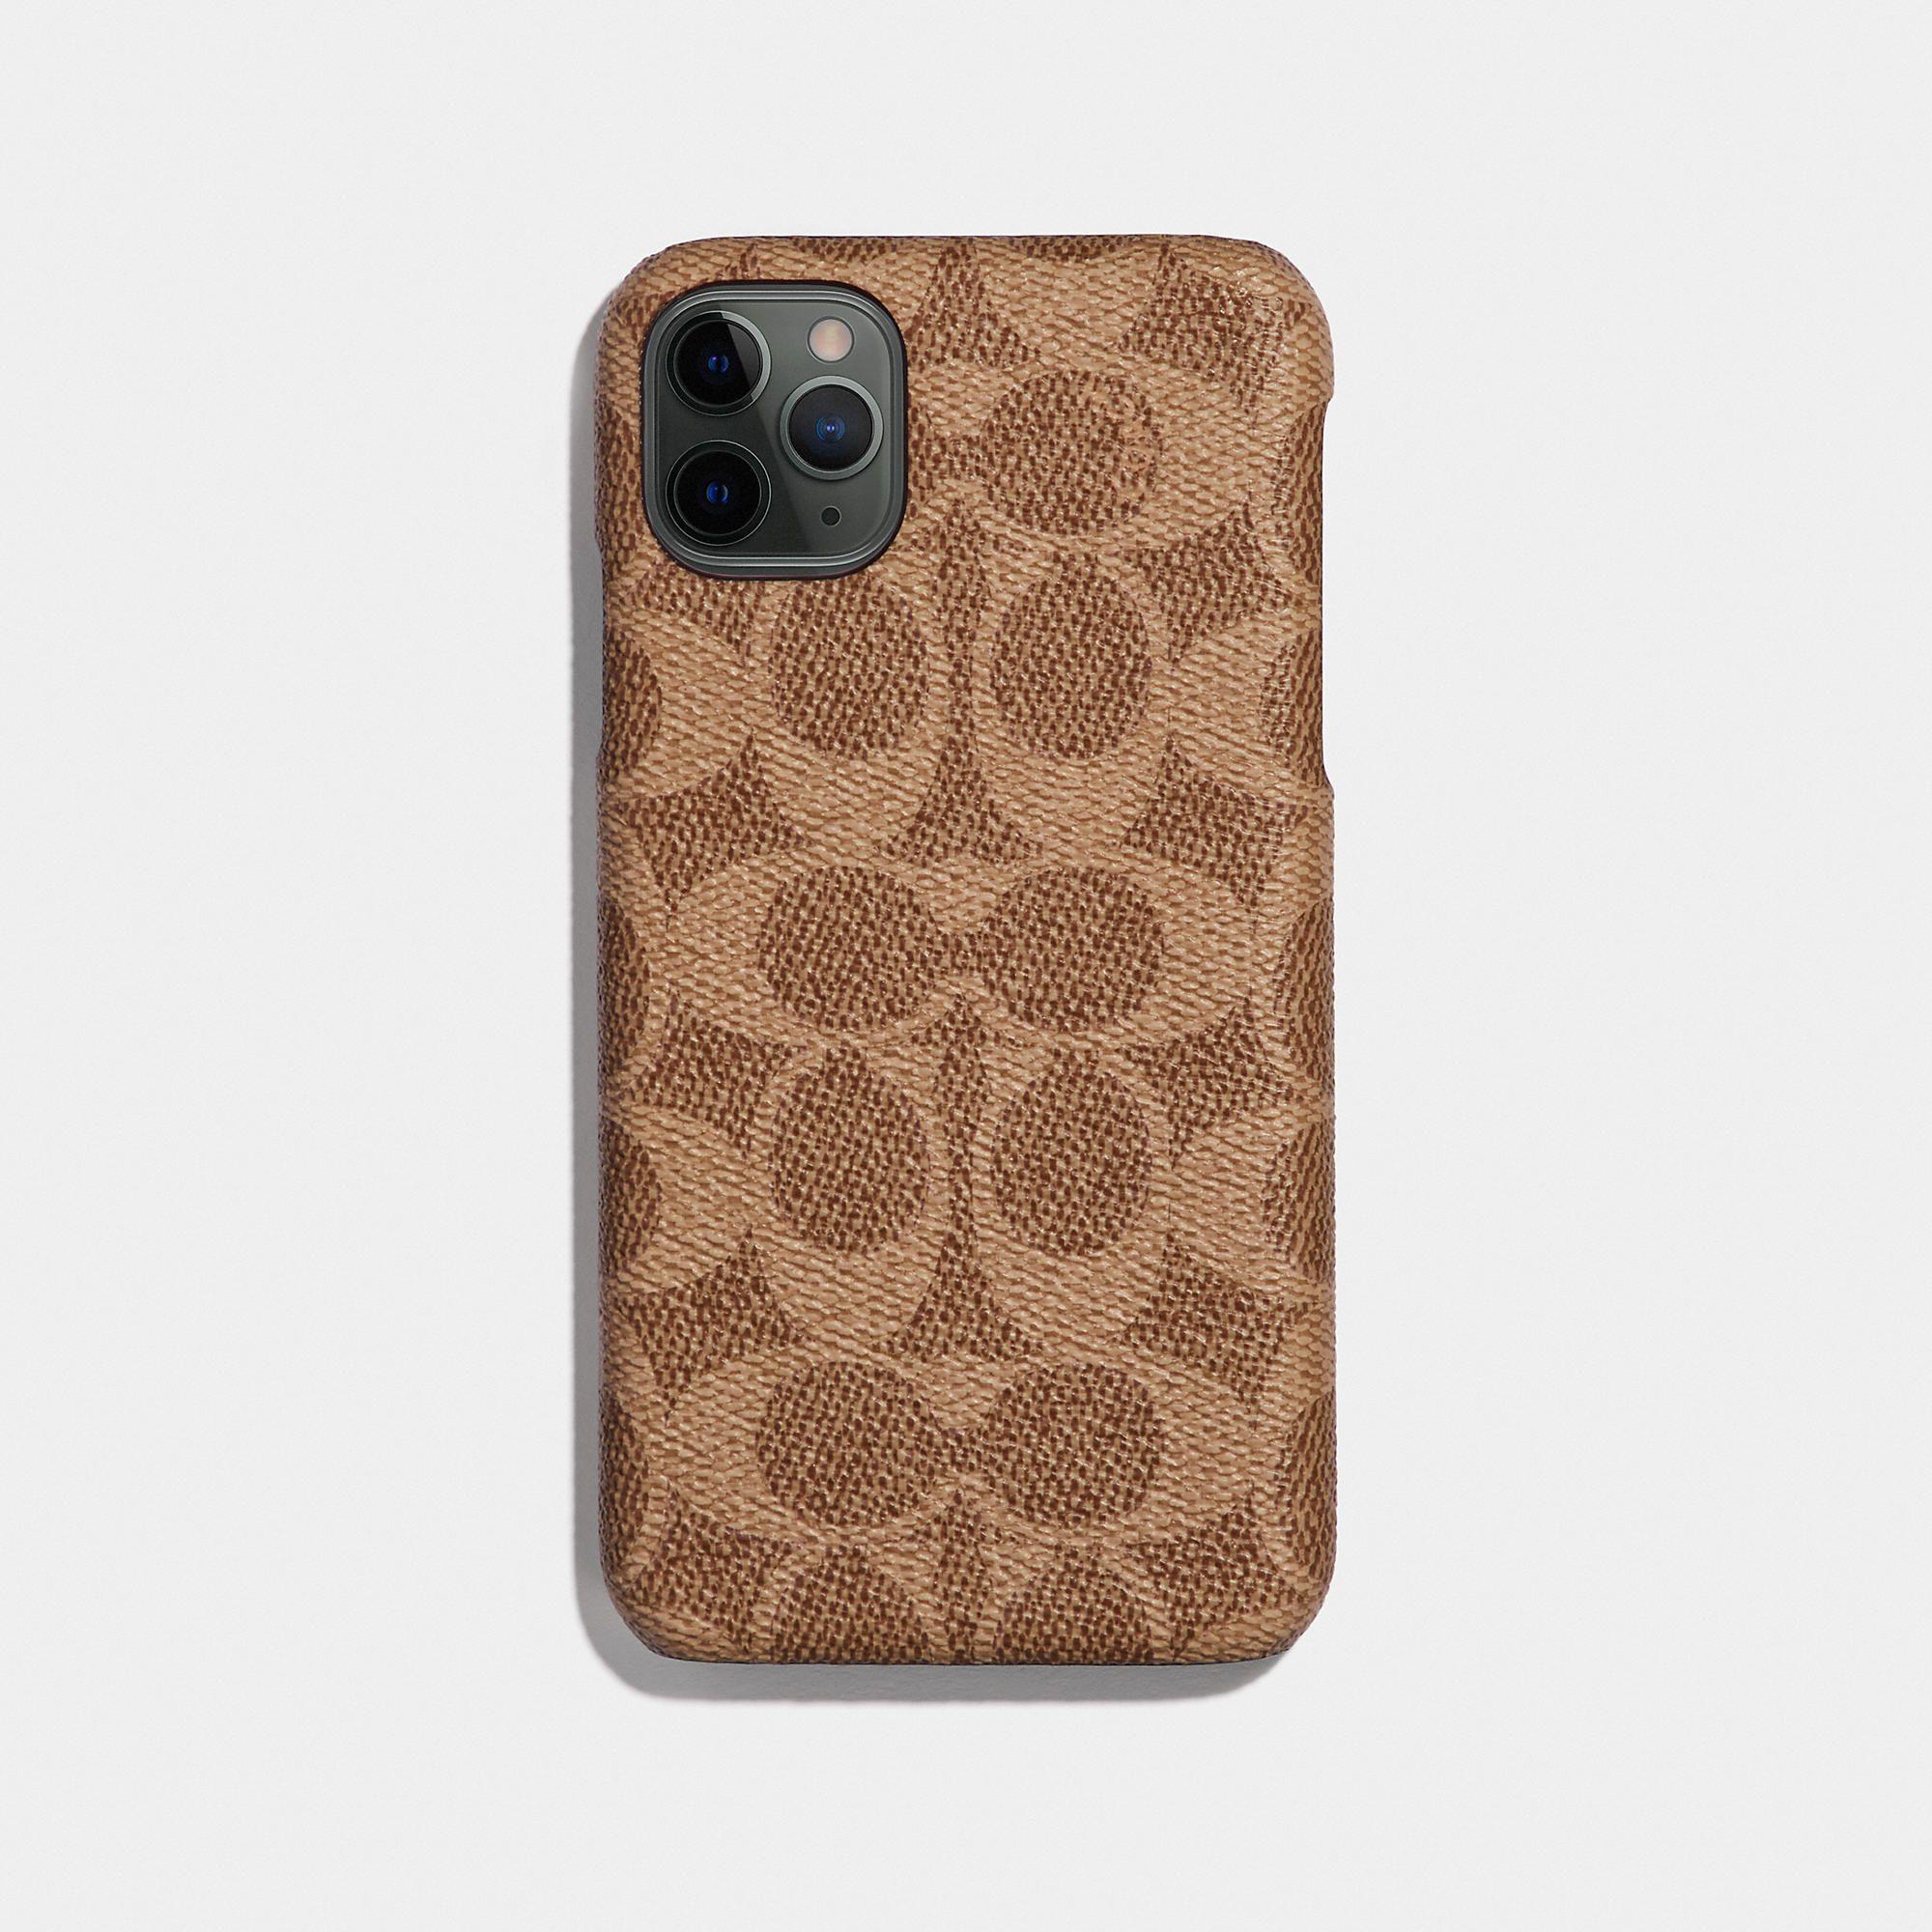 Iphone 11 Pro Case In Signature Canvas In 2020 Iphone 11 Pro Case Pretty Phone Cases Iphone 11